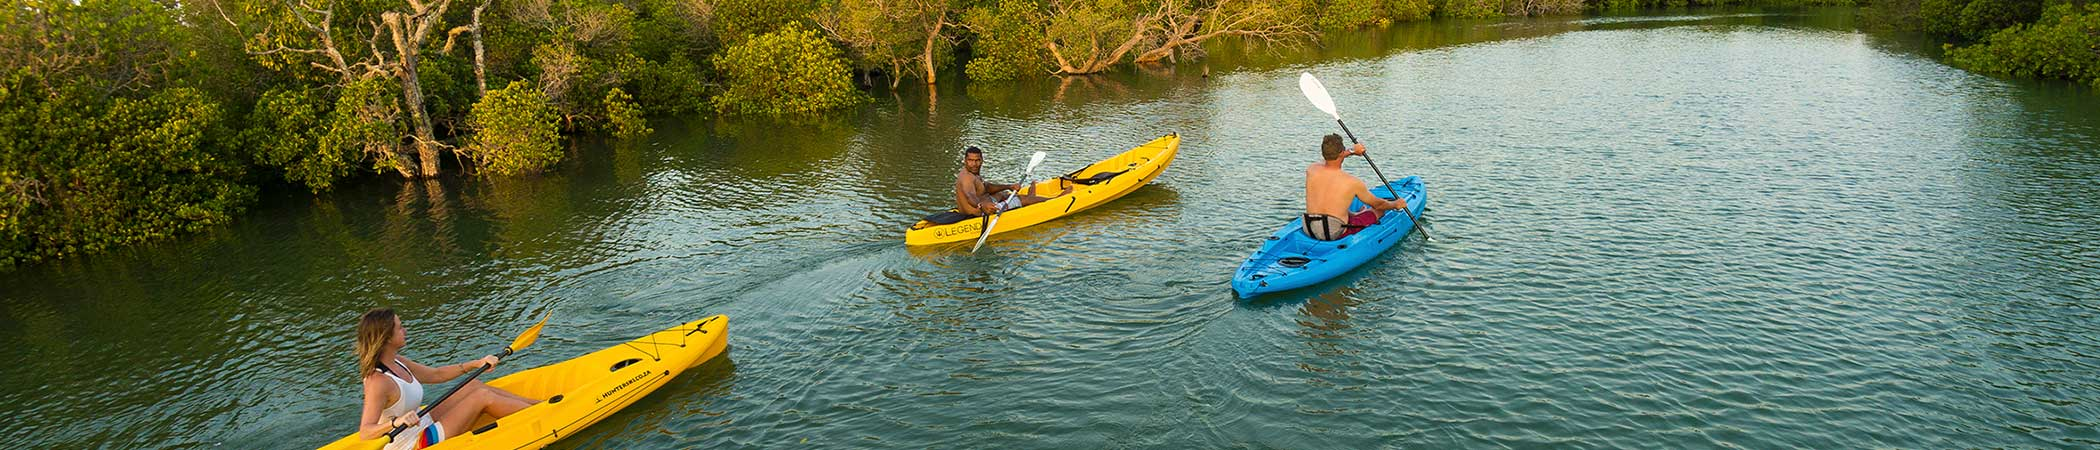 Mozambique Holiday Destination